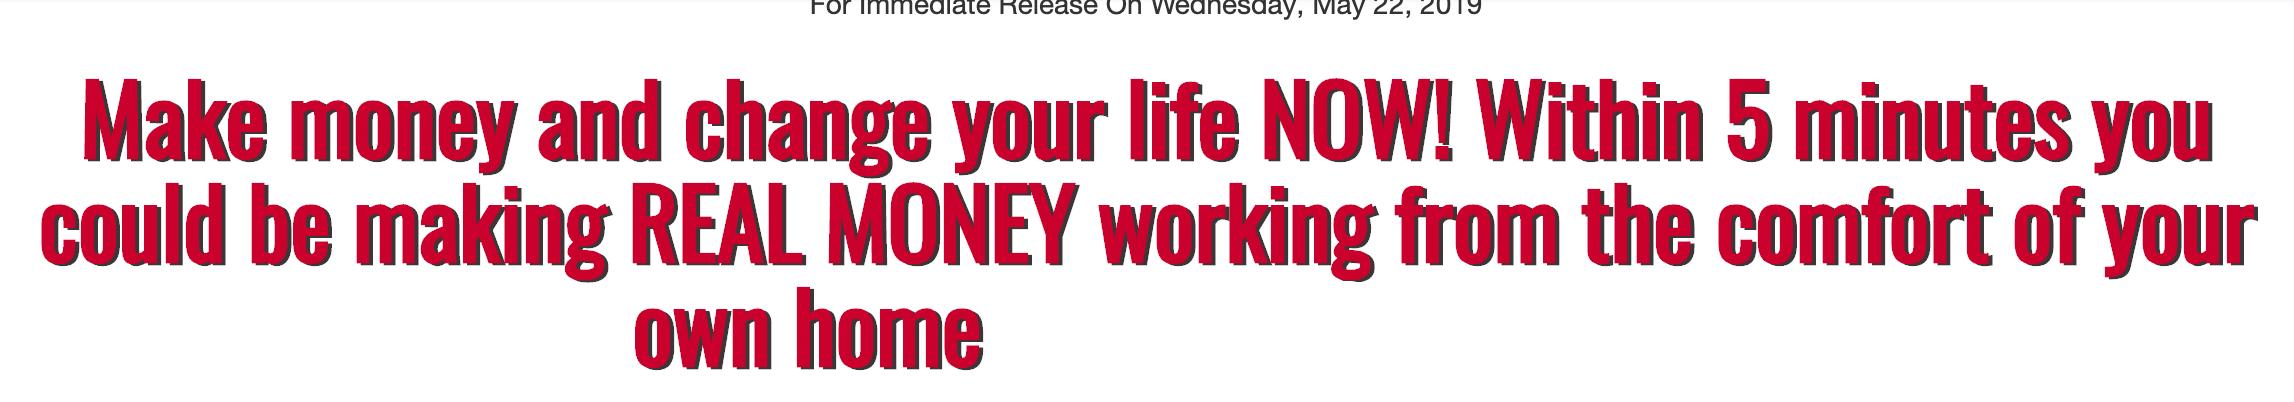 make money in 5 minutes